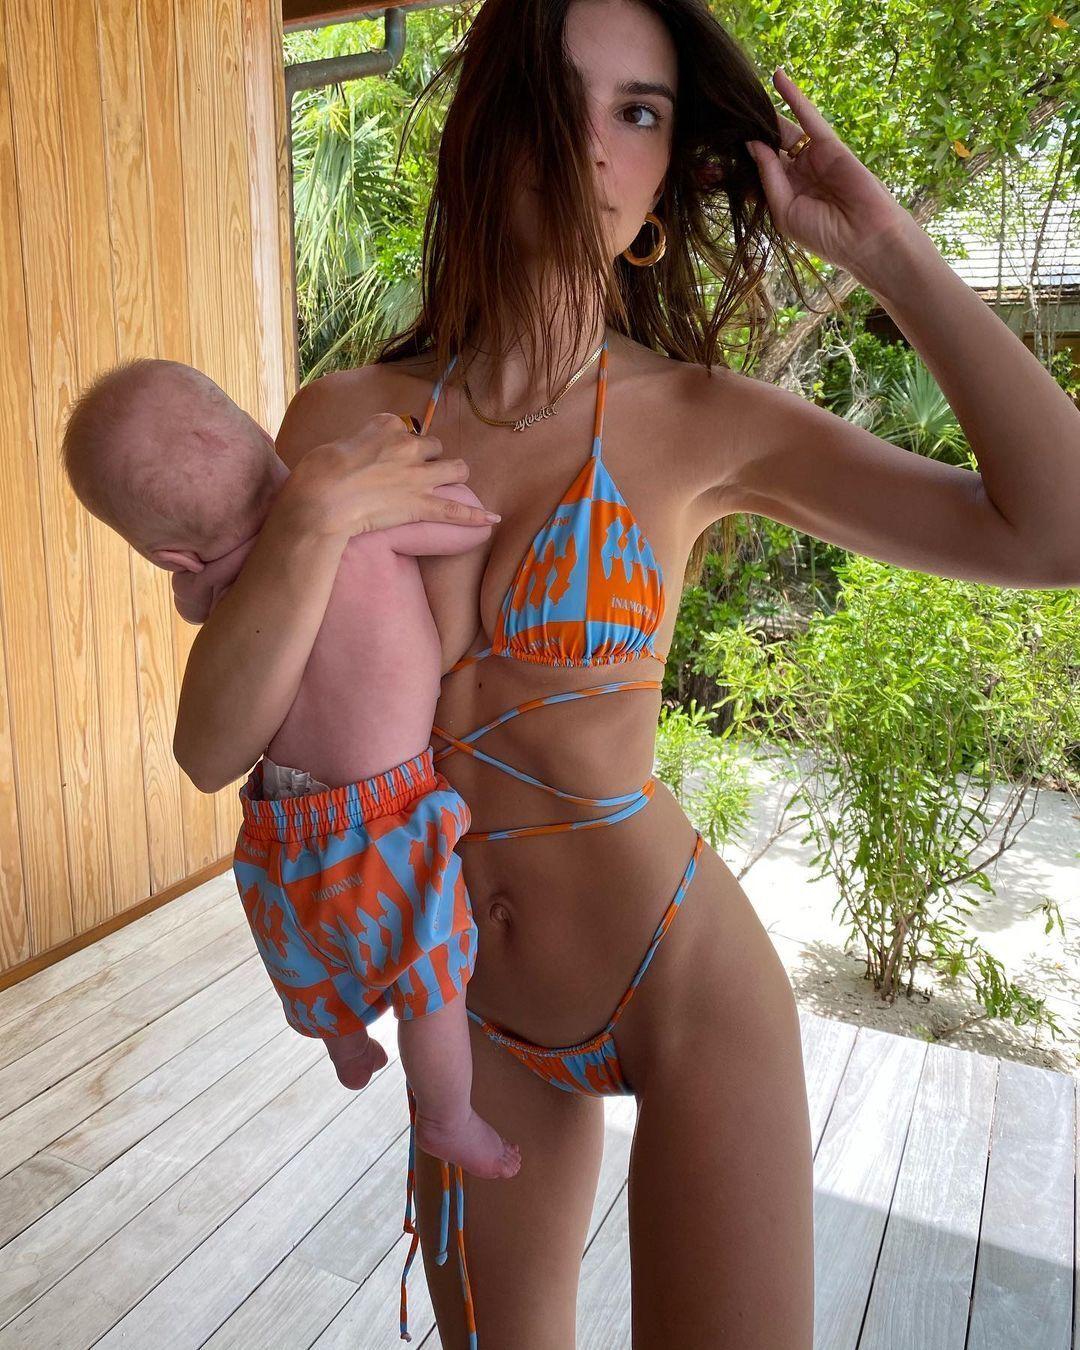 Ратаковскі в яскравому образі з малюком на руках